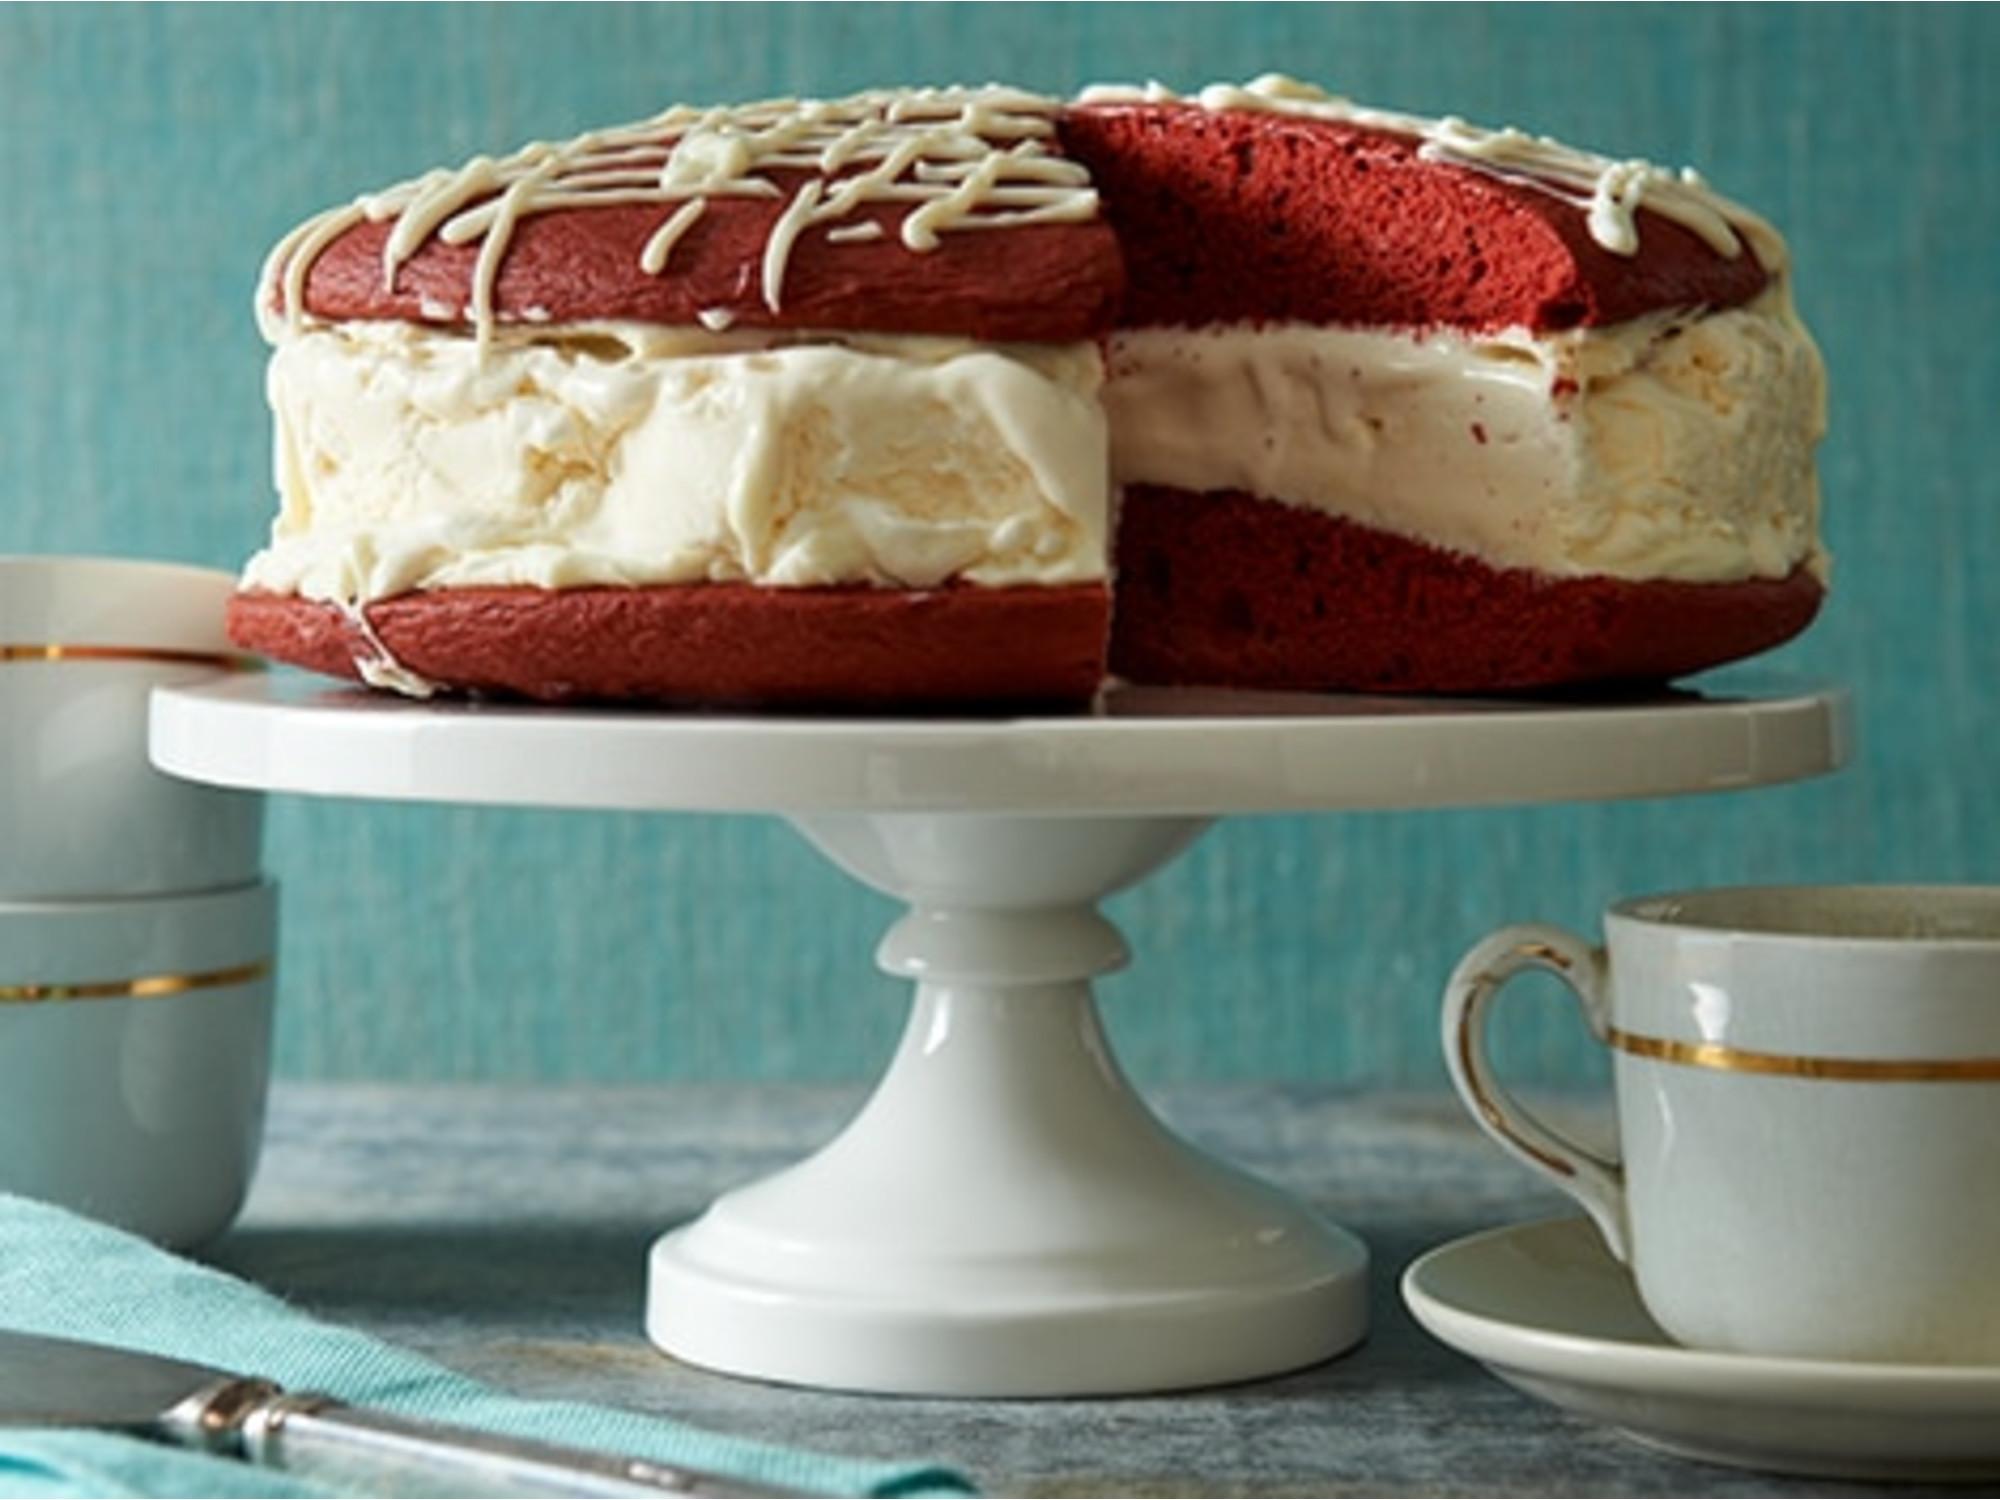 Red Velvet Whoopie Pie Ice Cream Cake